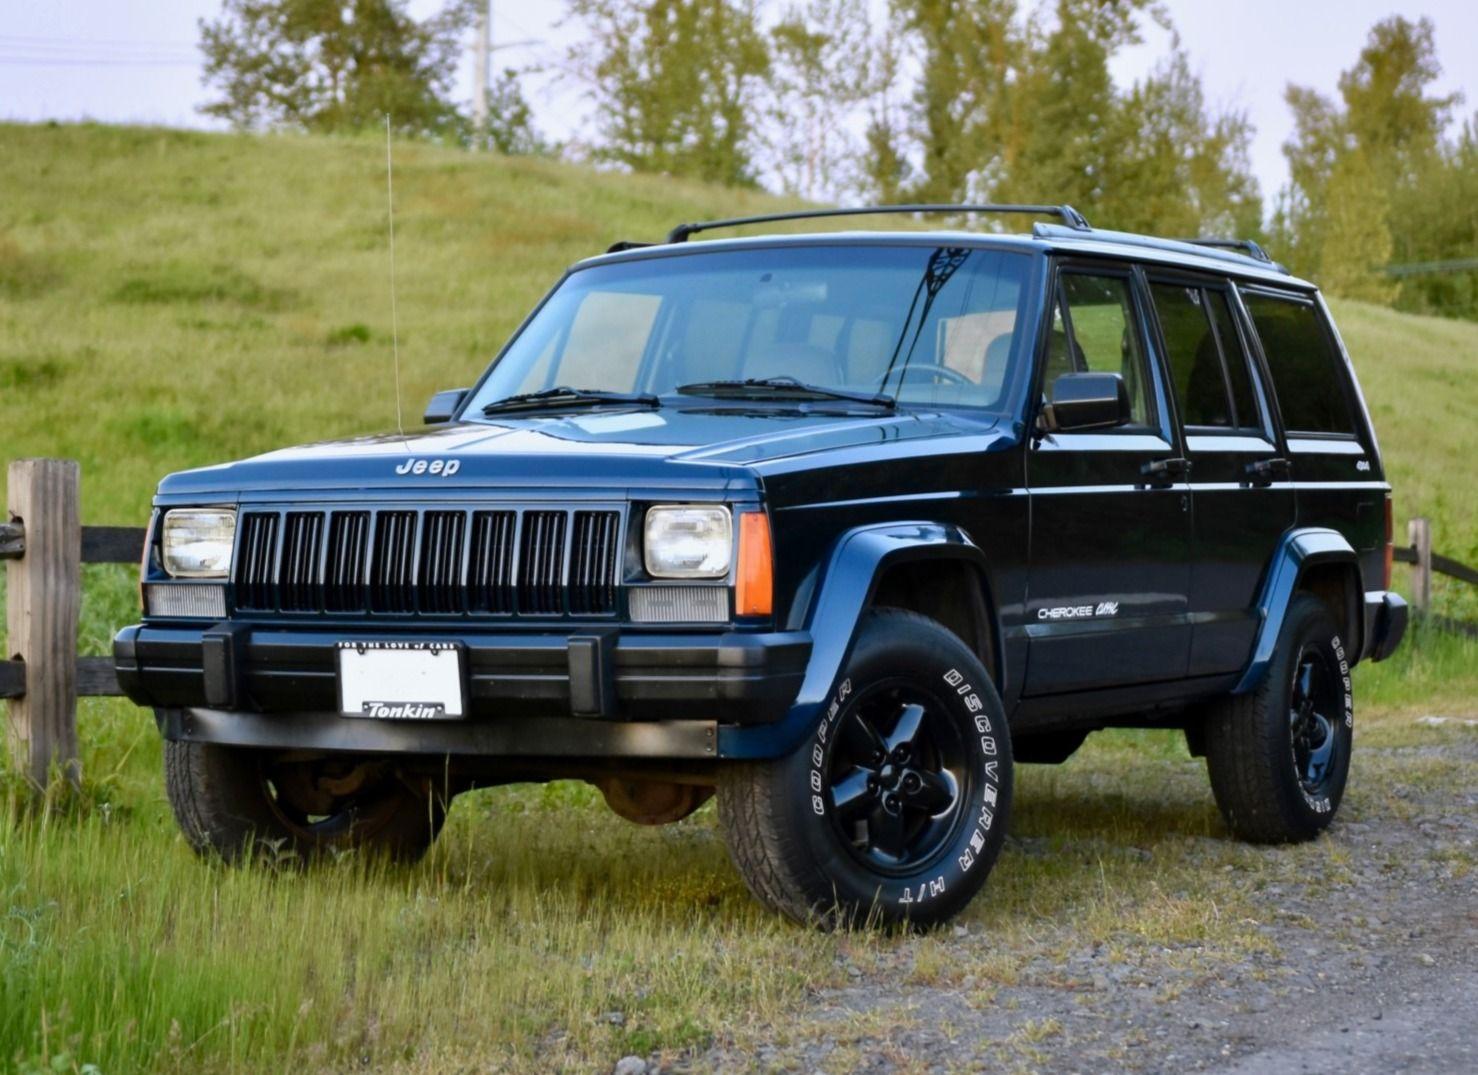 1996 Jeep Cherokee 4x4 Jeep cherokee, Jeep cherokee 4x4